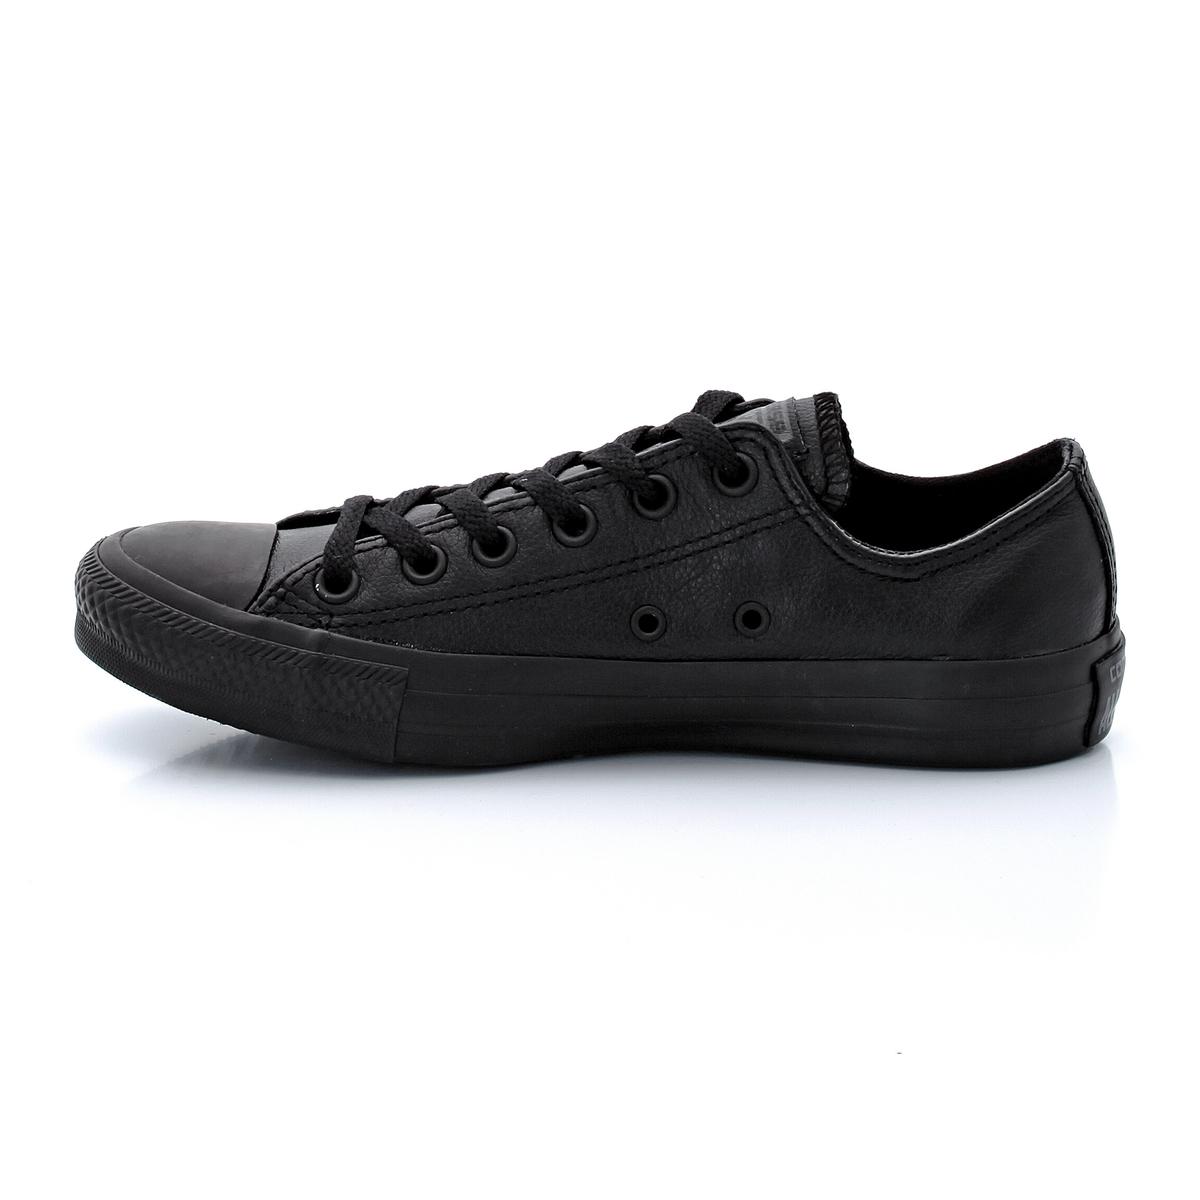 Imagen secundaria de producto de Zapatillas CHUCK TAYLOR ALL STAR OX MONO CUIR - Converse